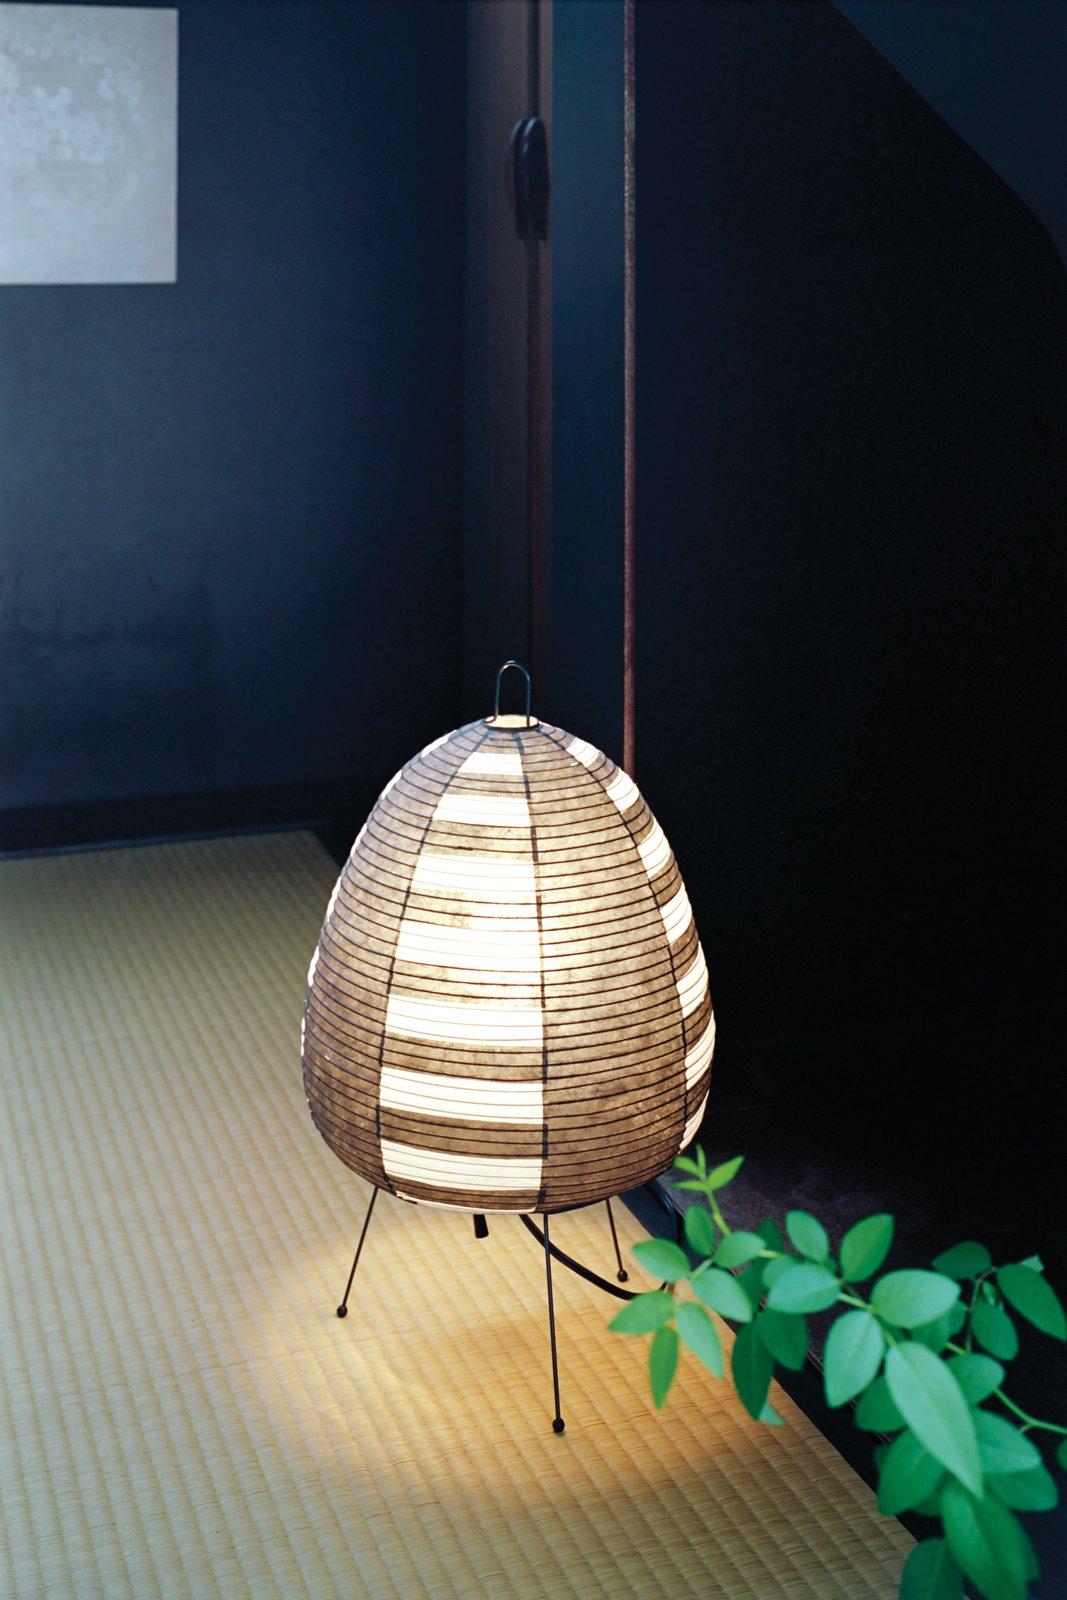 #lightingdesign #lighting #Noguchi #IsamuNoguchi #Akari1AS #lamp #soft #light #teahouse #calm #Nagoya #Japan #modern #minimalist   Interesting lights